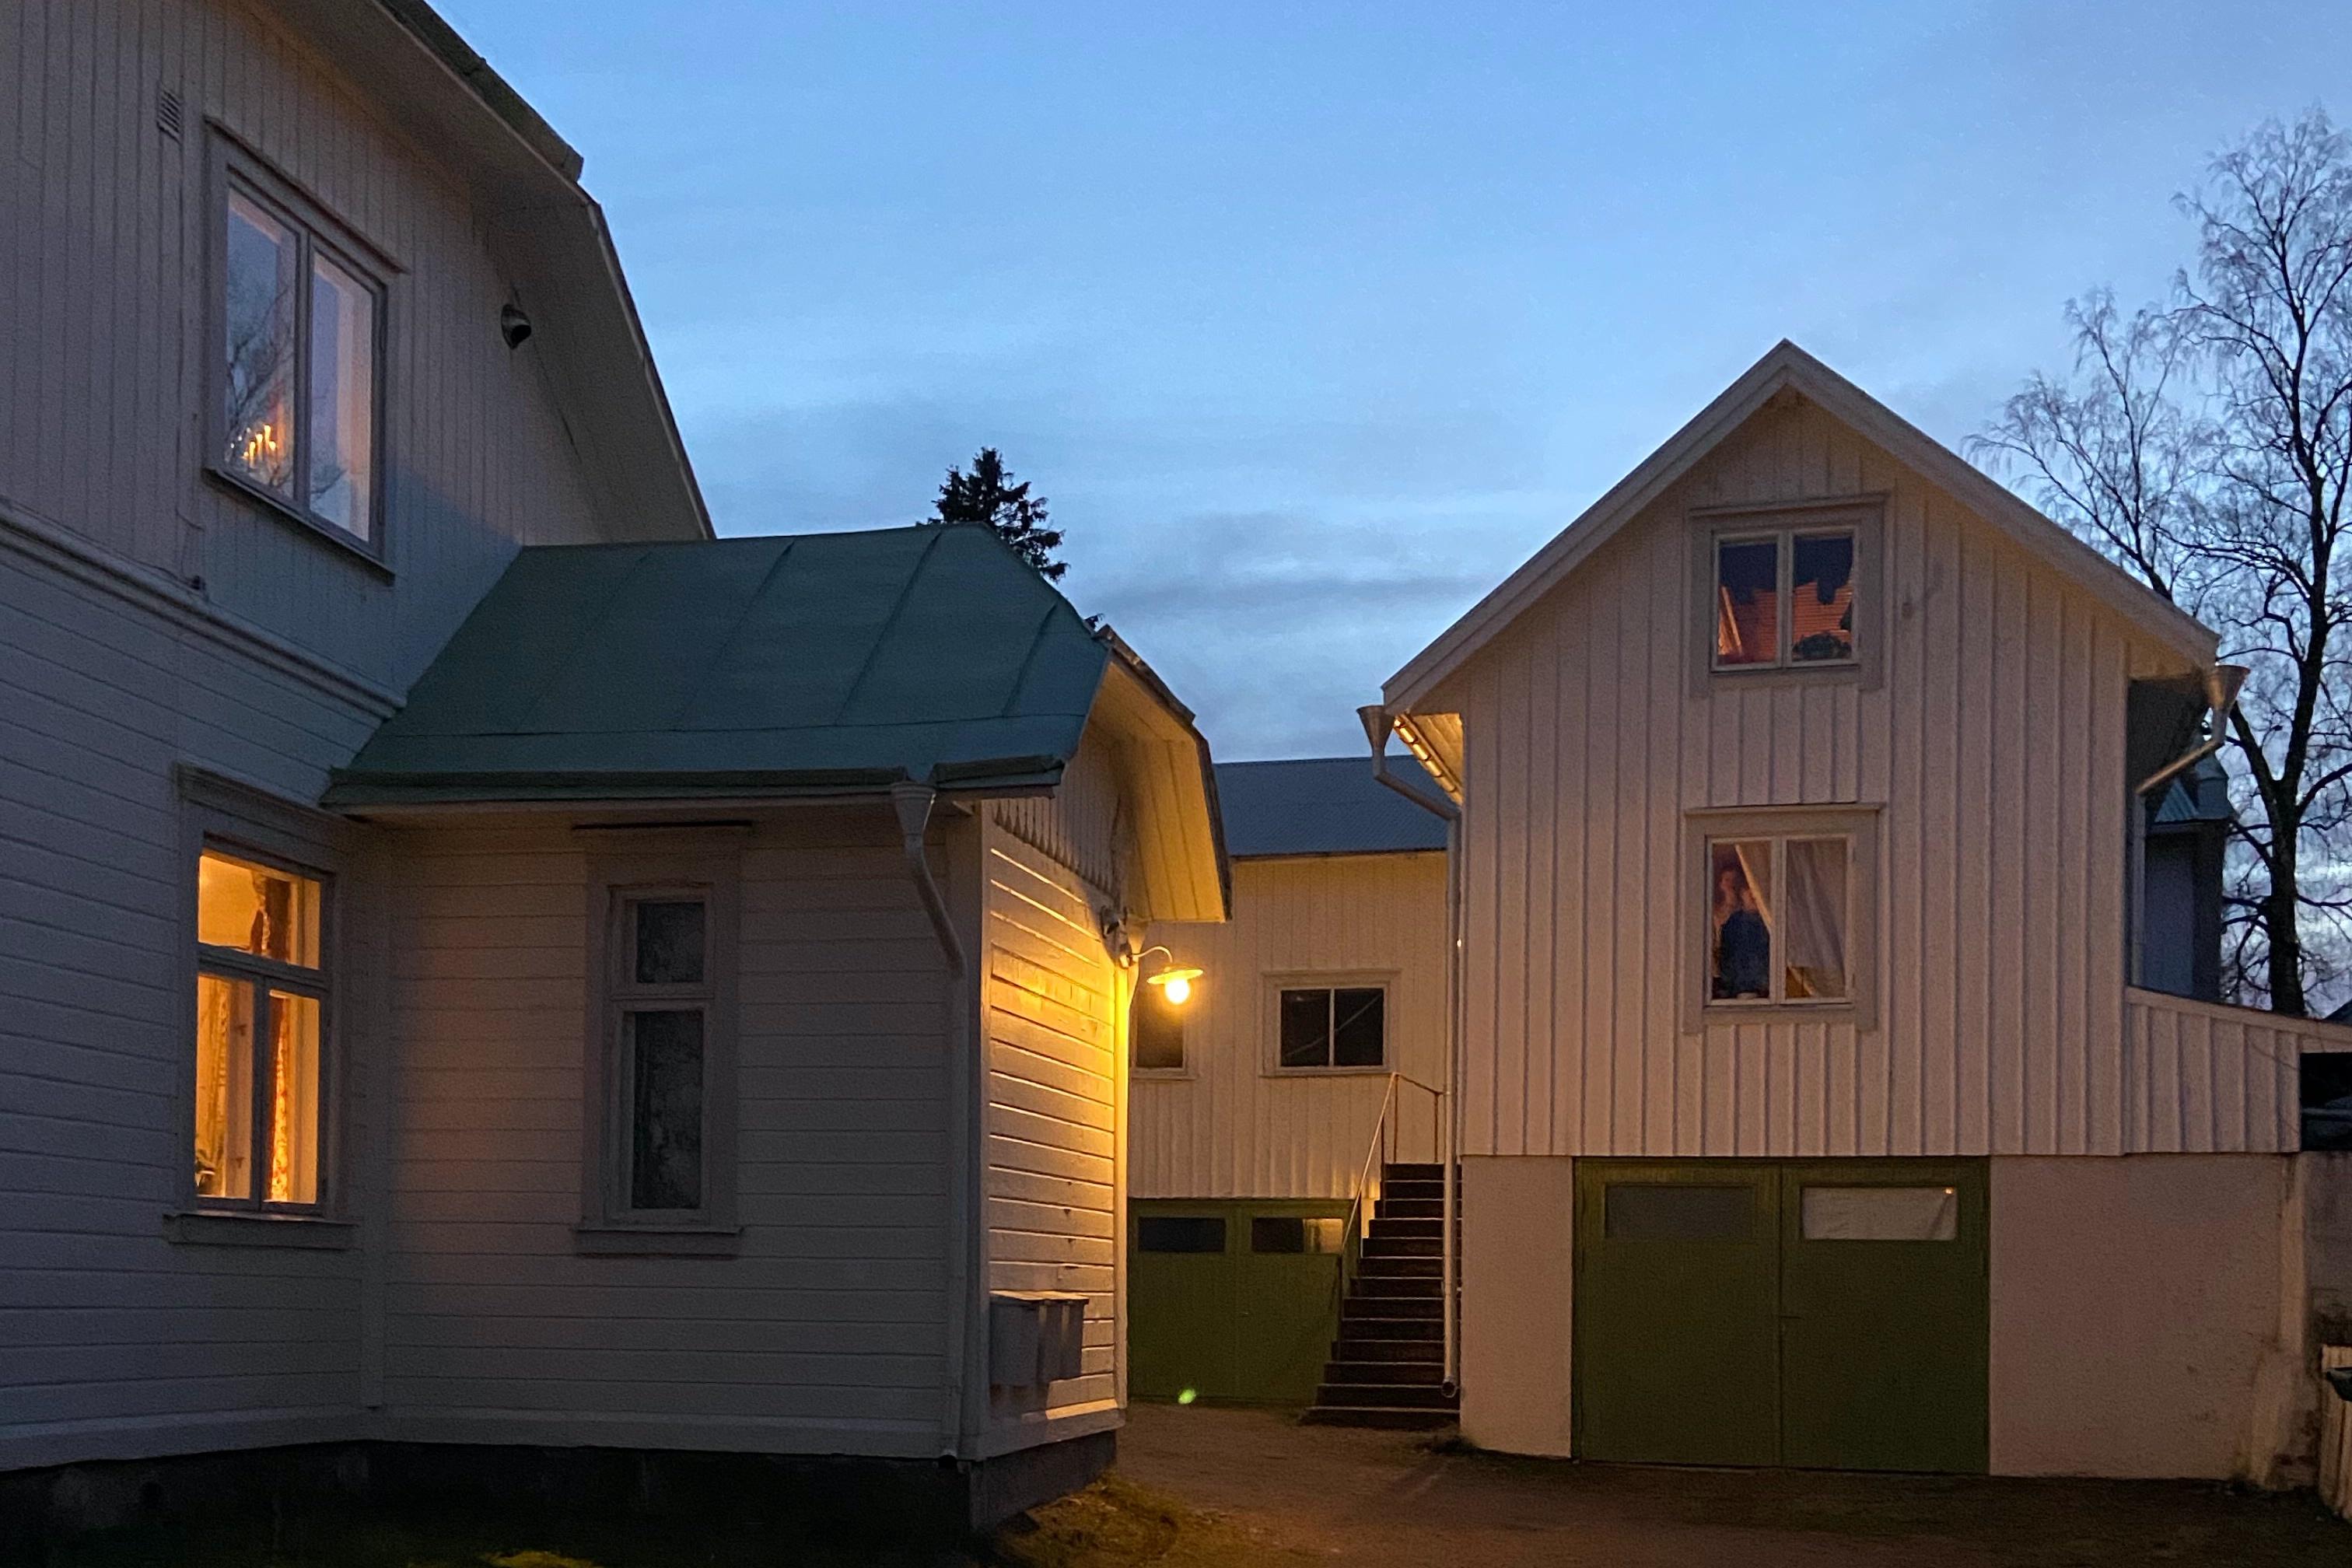 Grdshuset i den lilla byn Floby - Guest houses for Rent in